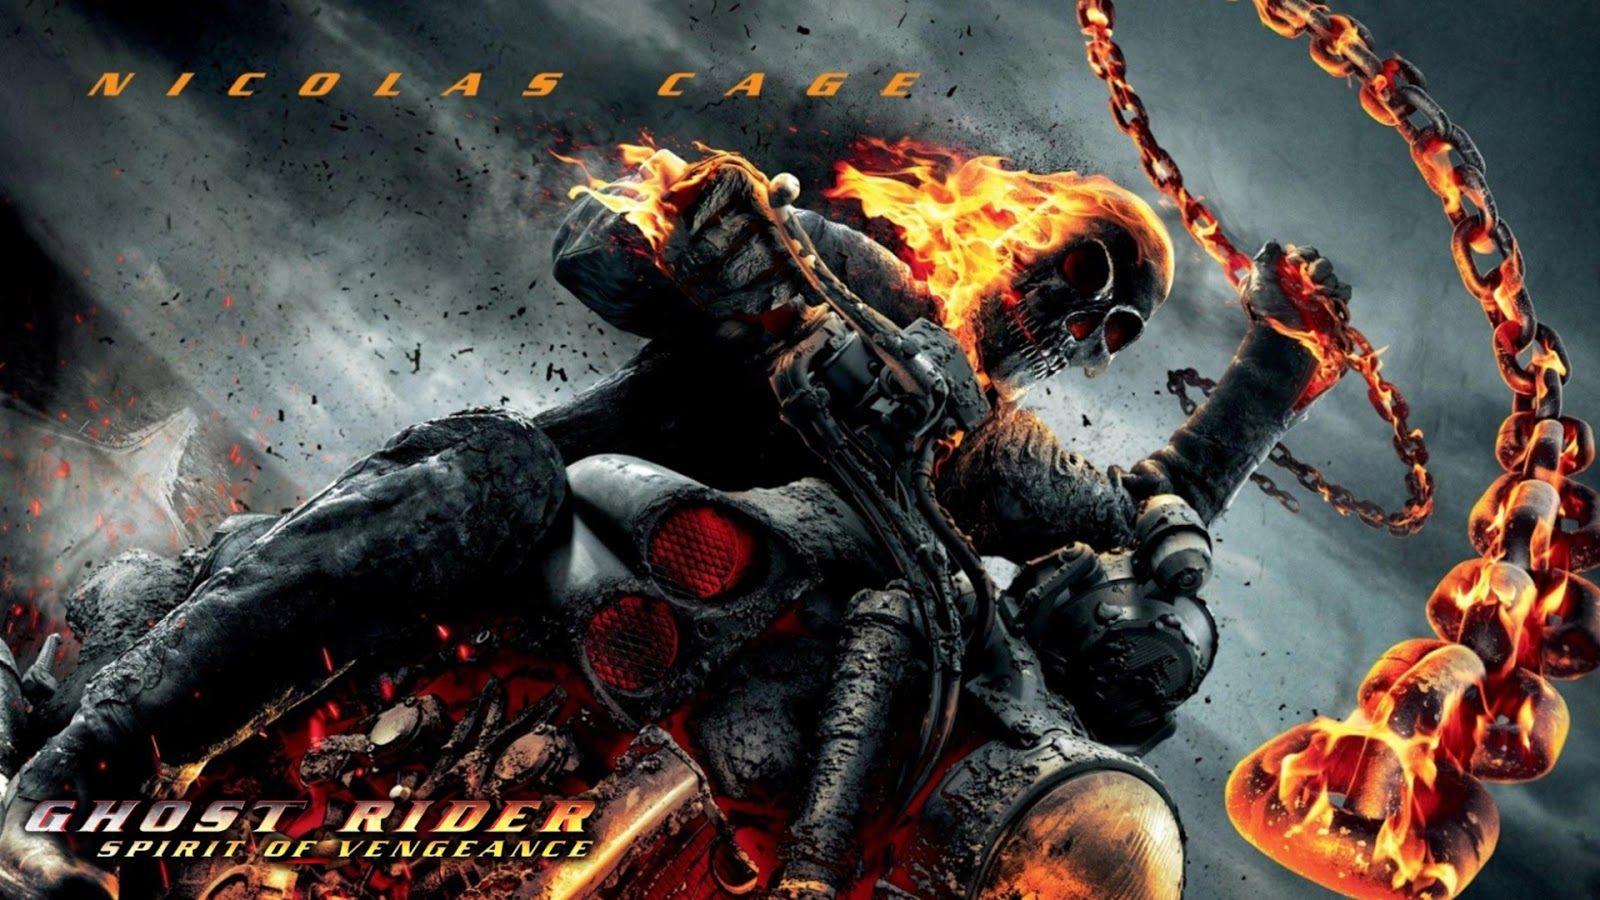 ghost rider spirit of vengeance | Ghost Rider Spirit of ...